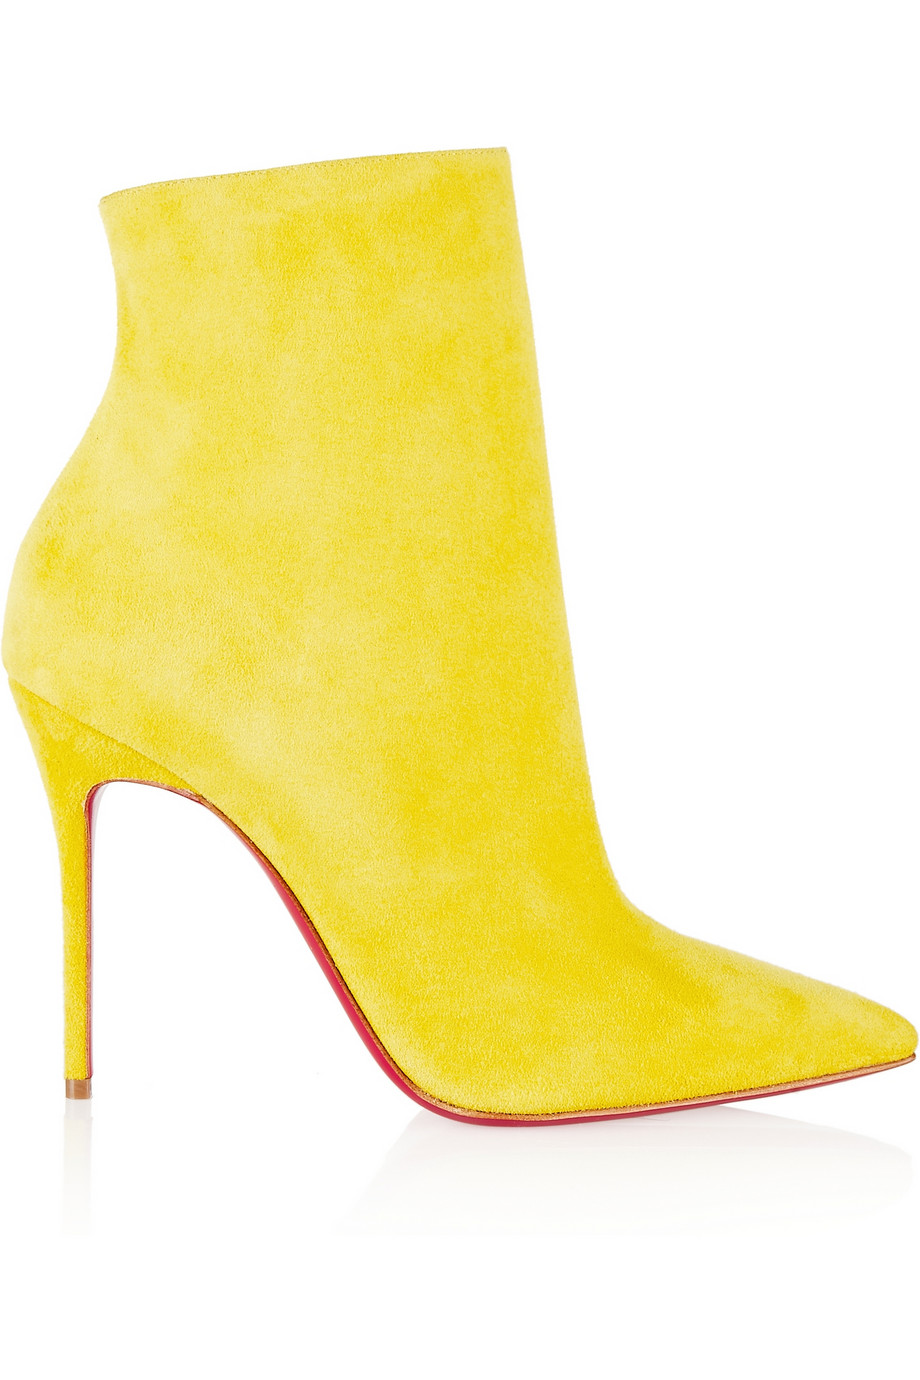 d3c0c5f27f1 CHRISTIAN LOUBOUTIN So Kate 100 suede ankle boots   Citrus Colors ...